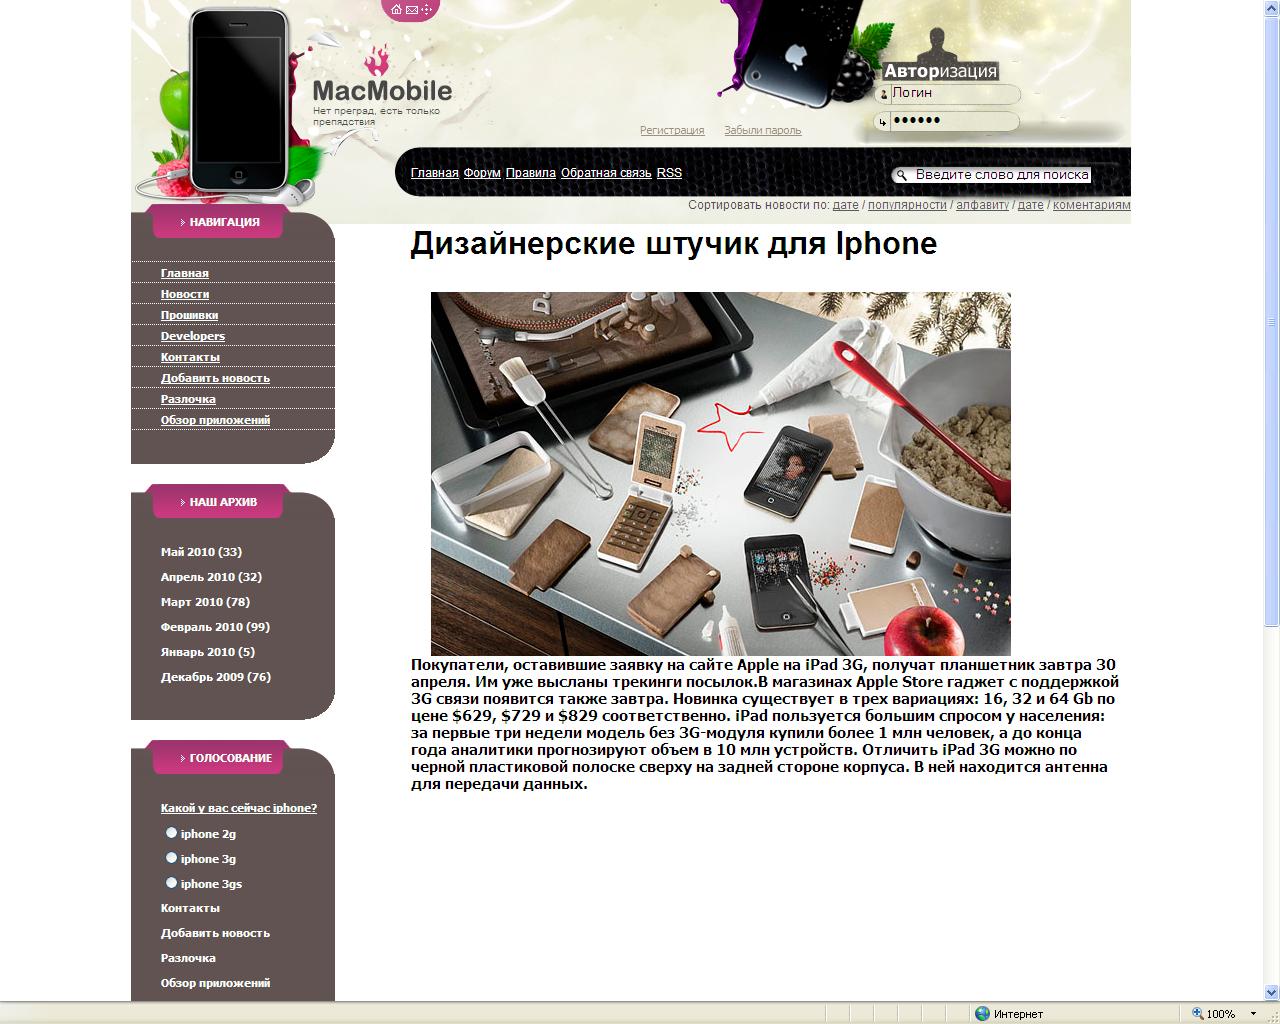 Верстка сайта по макету PSD - MacMobile